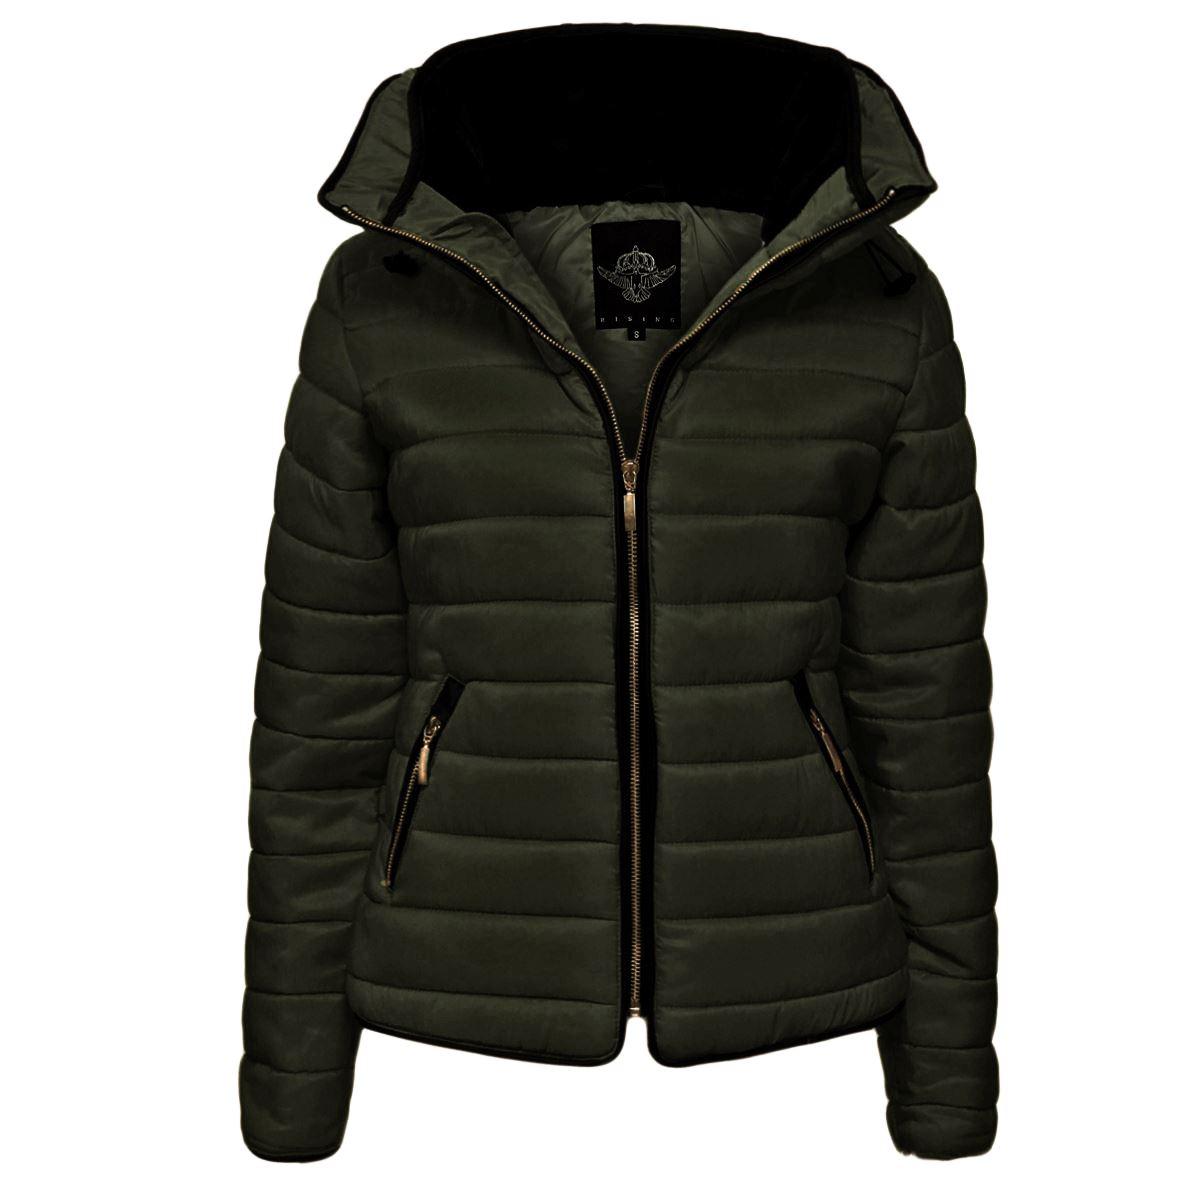 Black puffy coat with fur hood